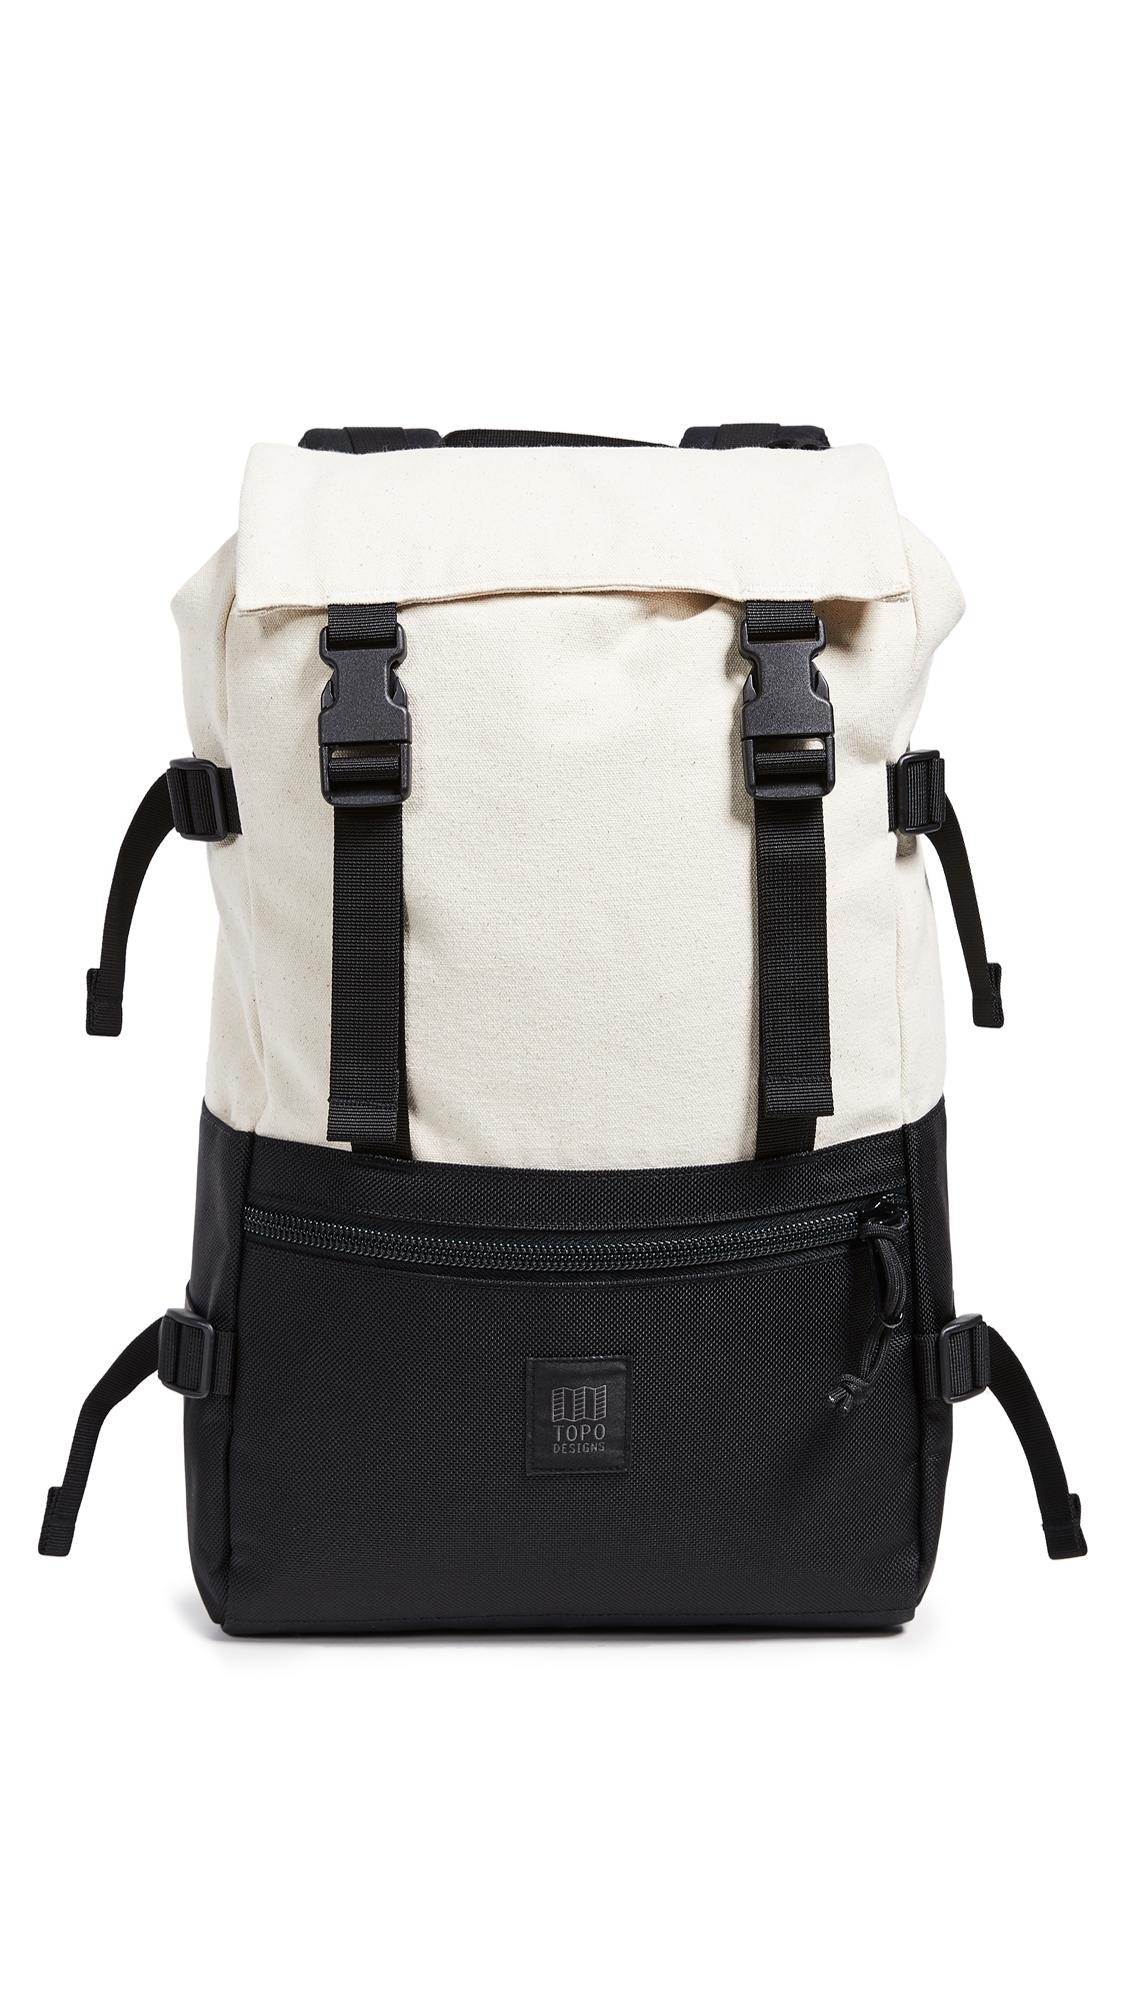 Topo Designs Backpacks ROVER PACK BACKPACK